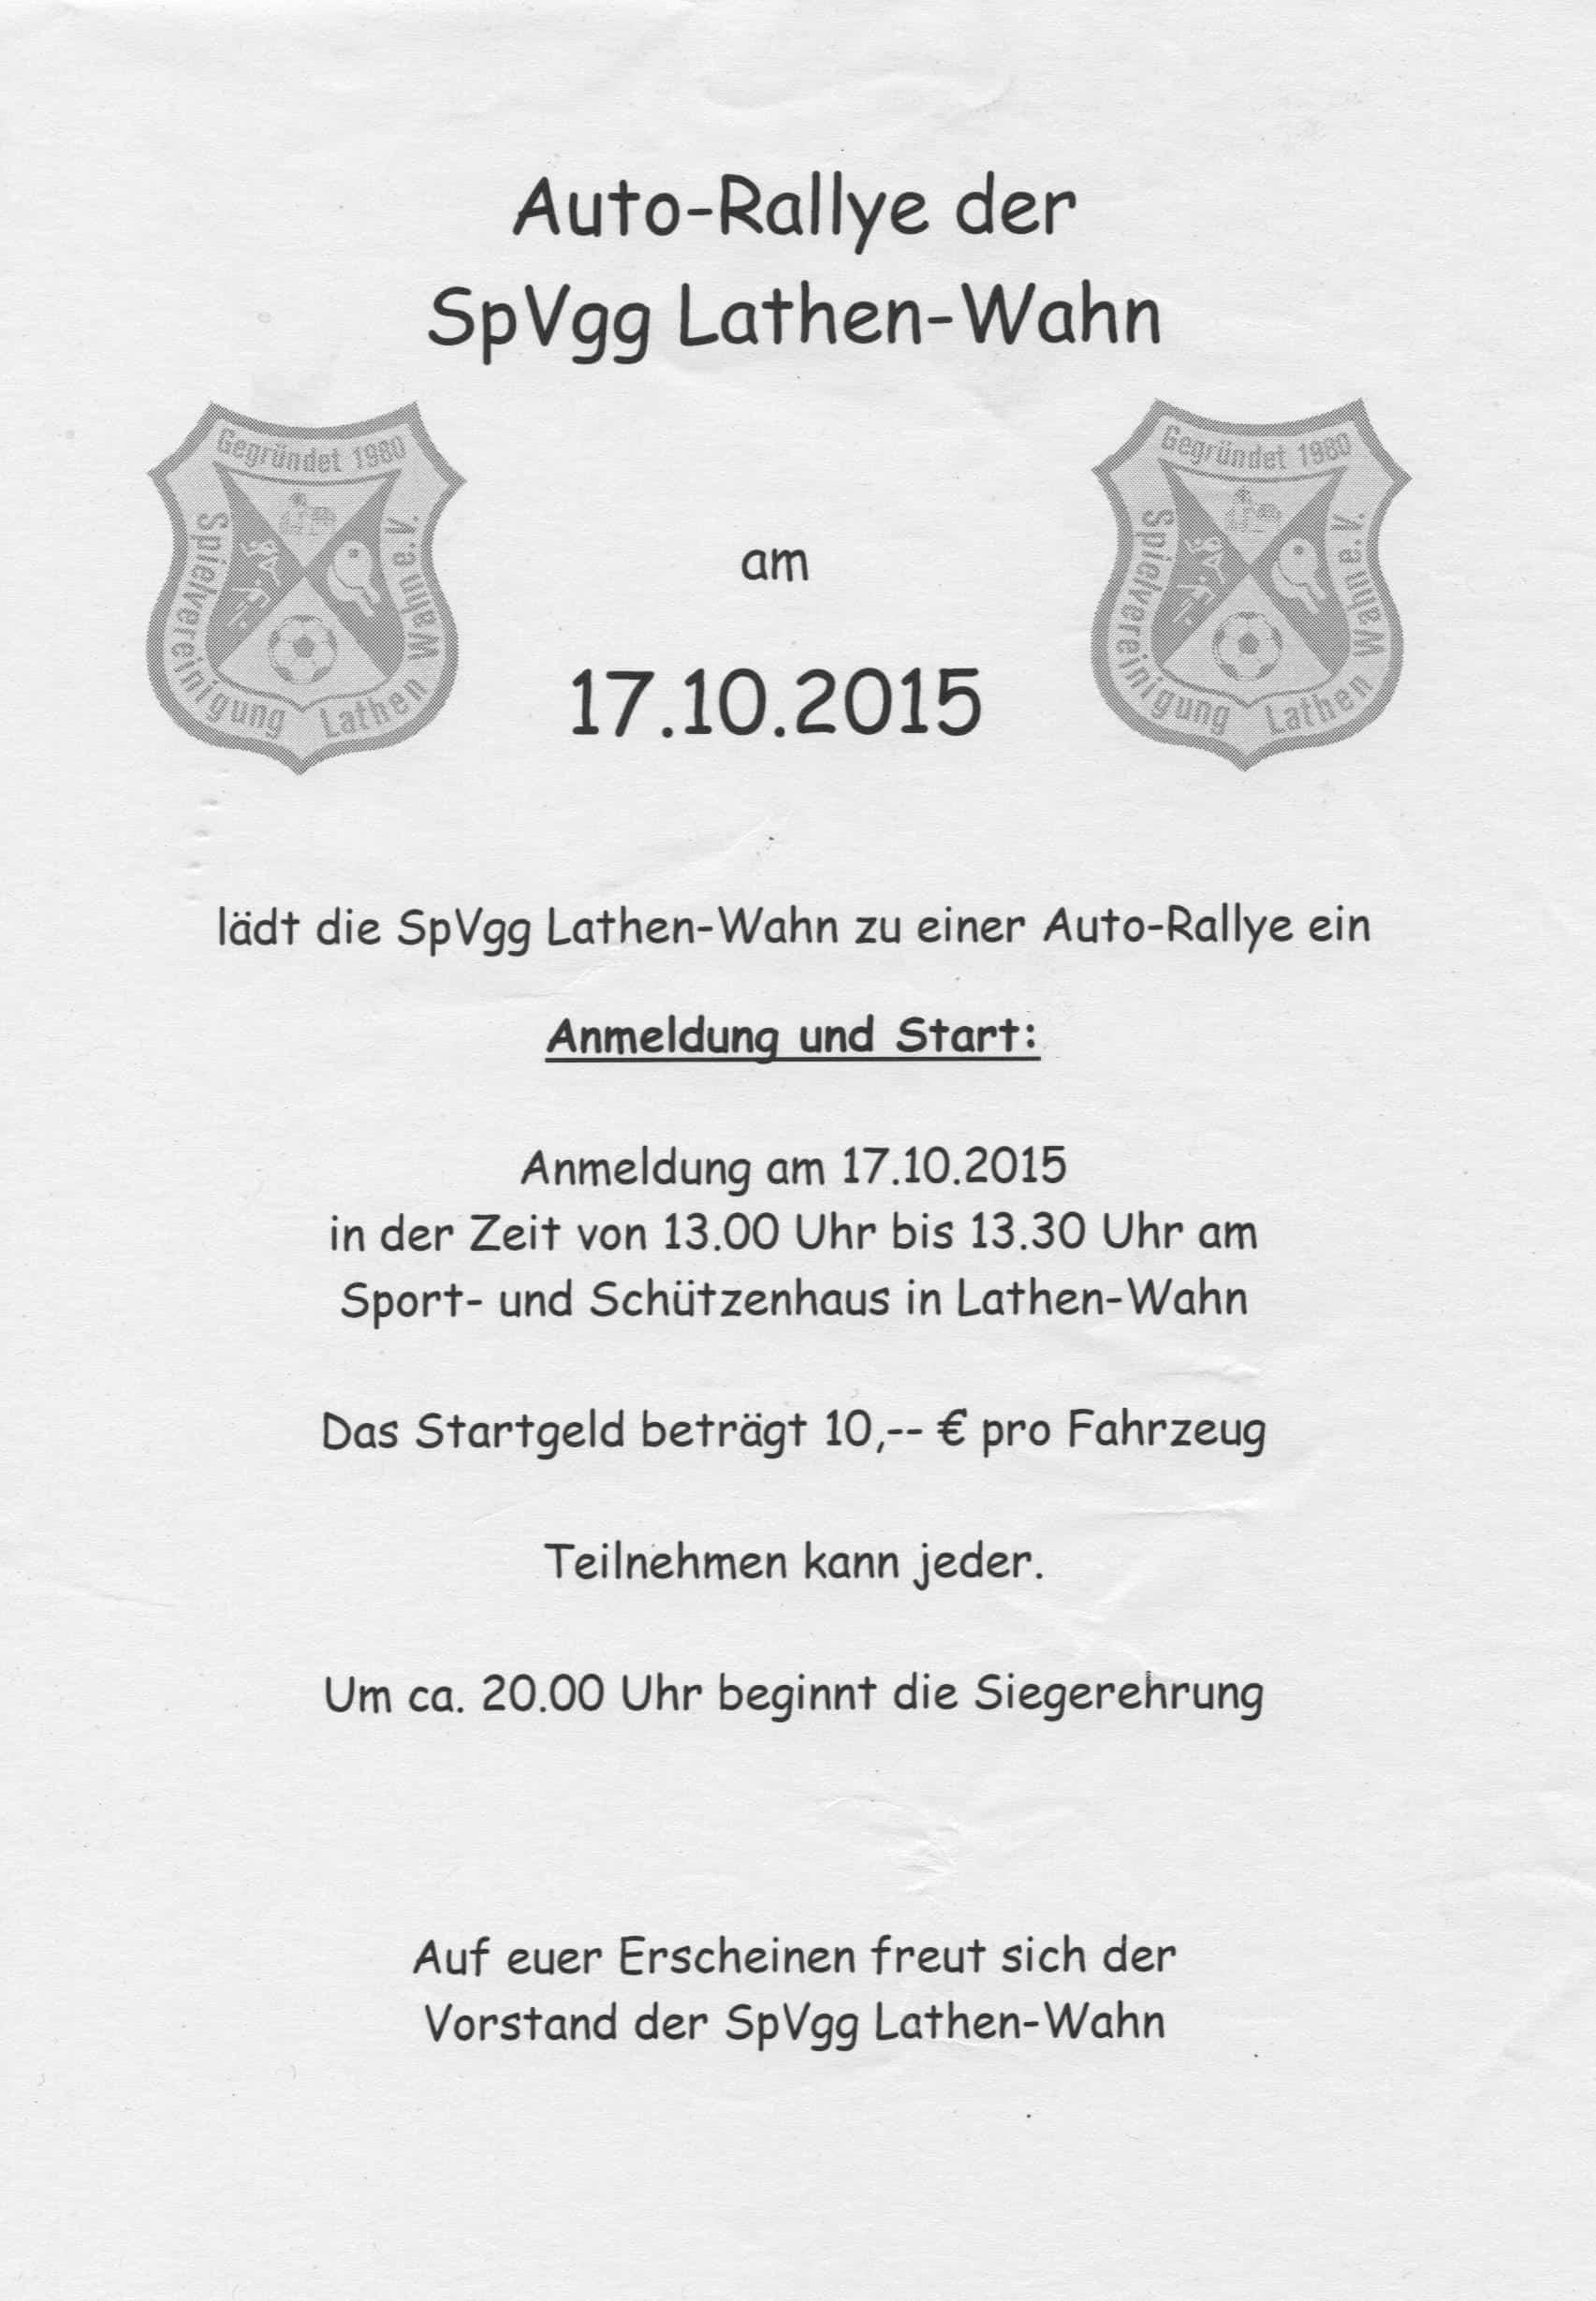 Auto-Rallye 2015